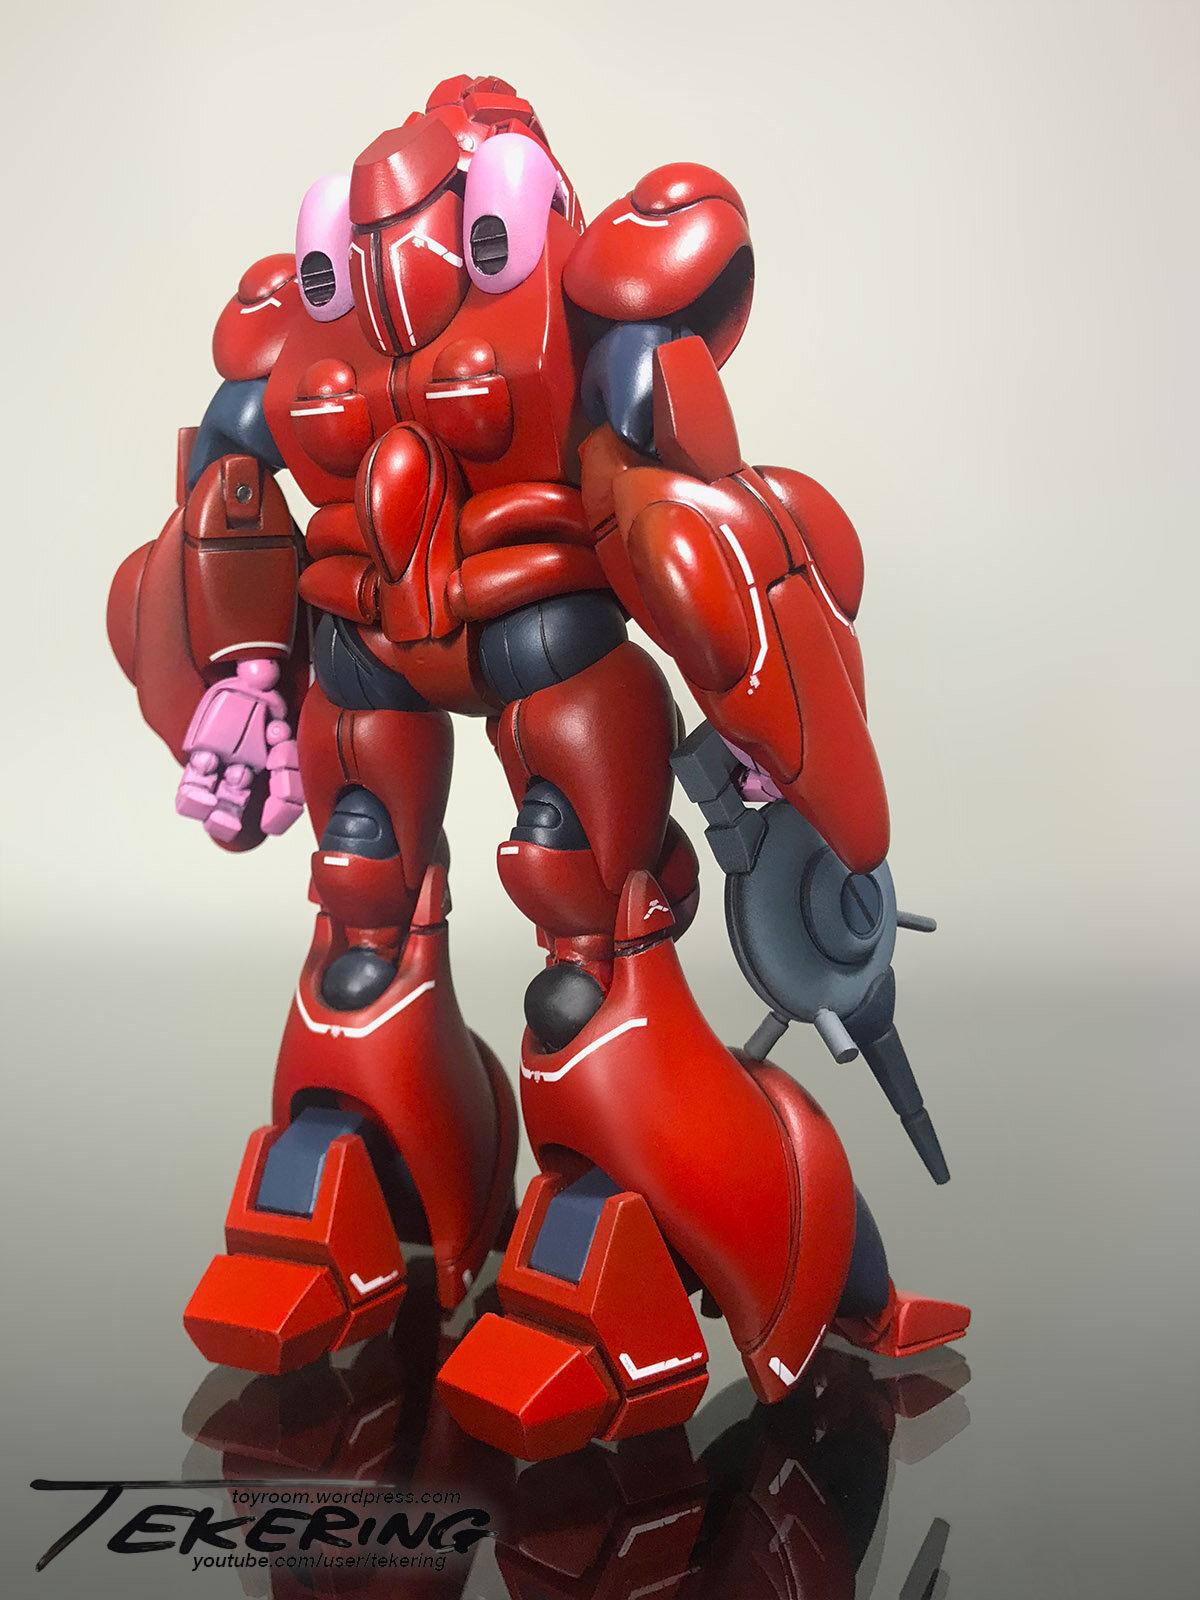 Bioroid-Commander-Red-back.jpg.e74b4d081f00f4de3b28e411e9c9d0a3.jpg